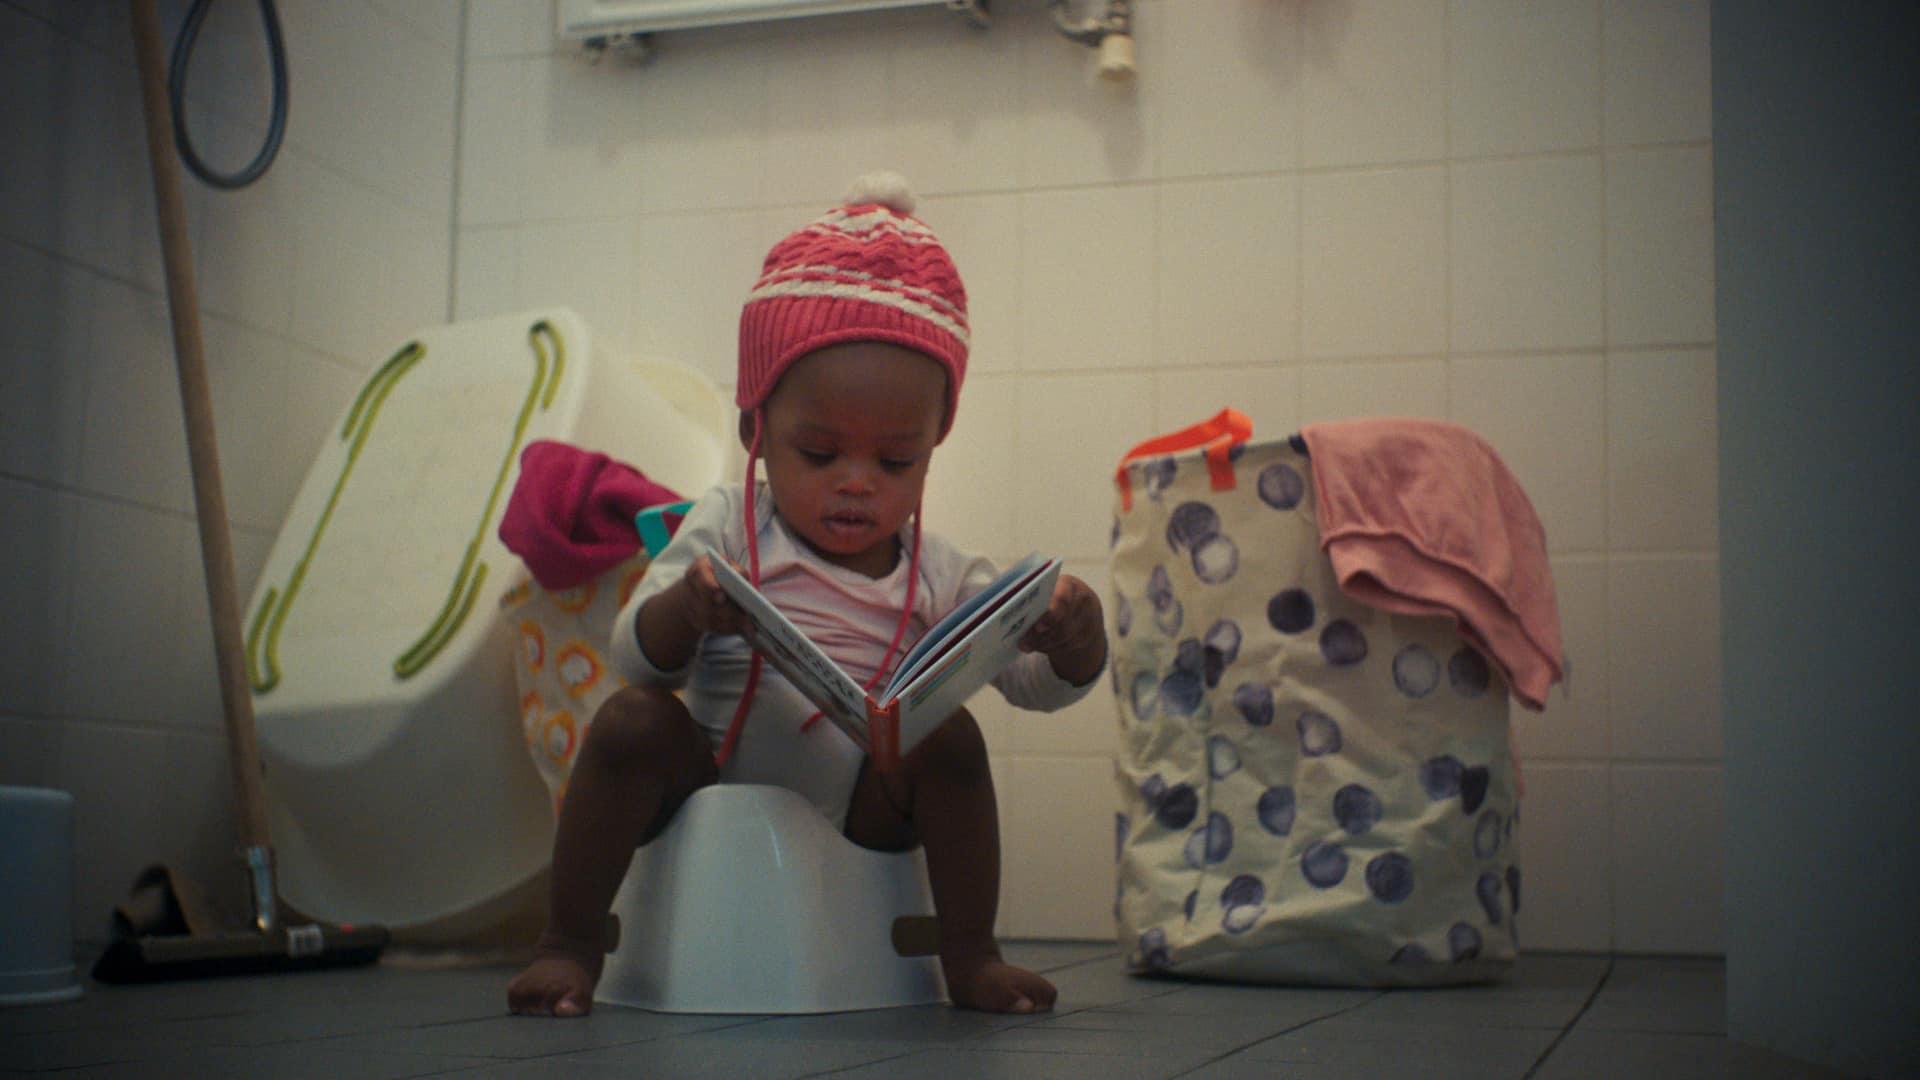 Blokker Baby; Alles van baby box tot baby badje en babykleding - Mamaliefde.nl